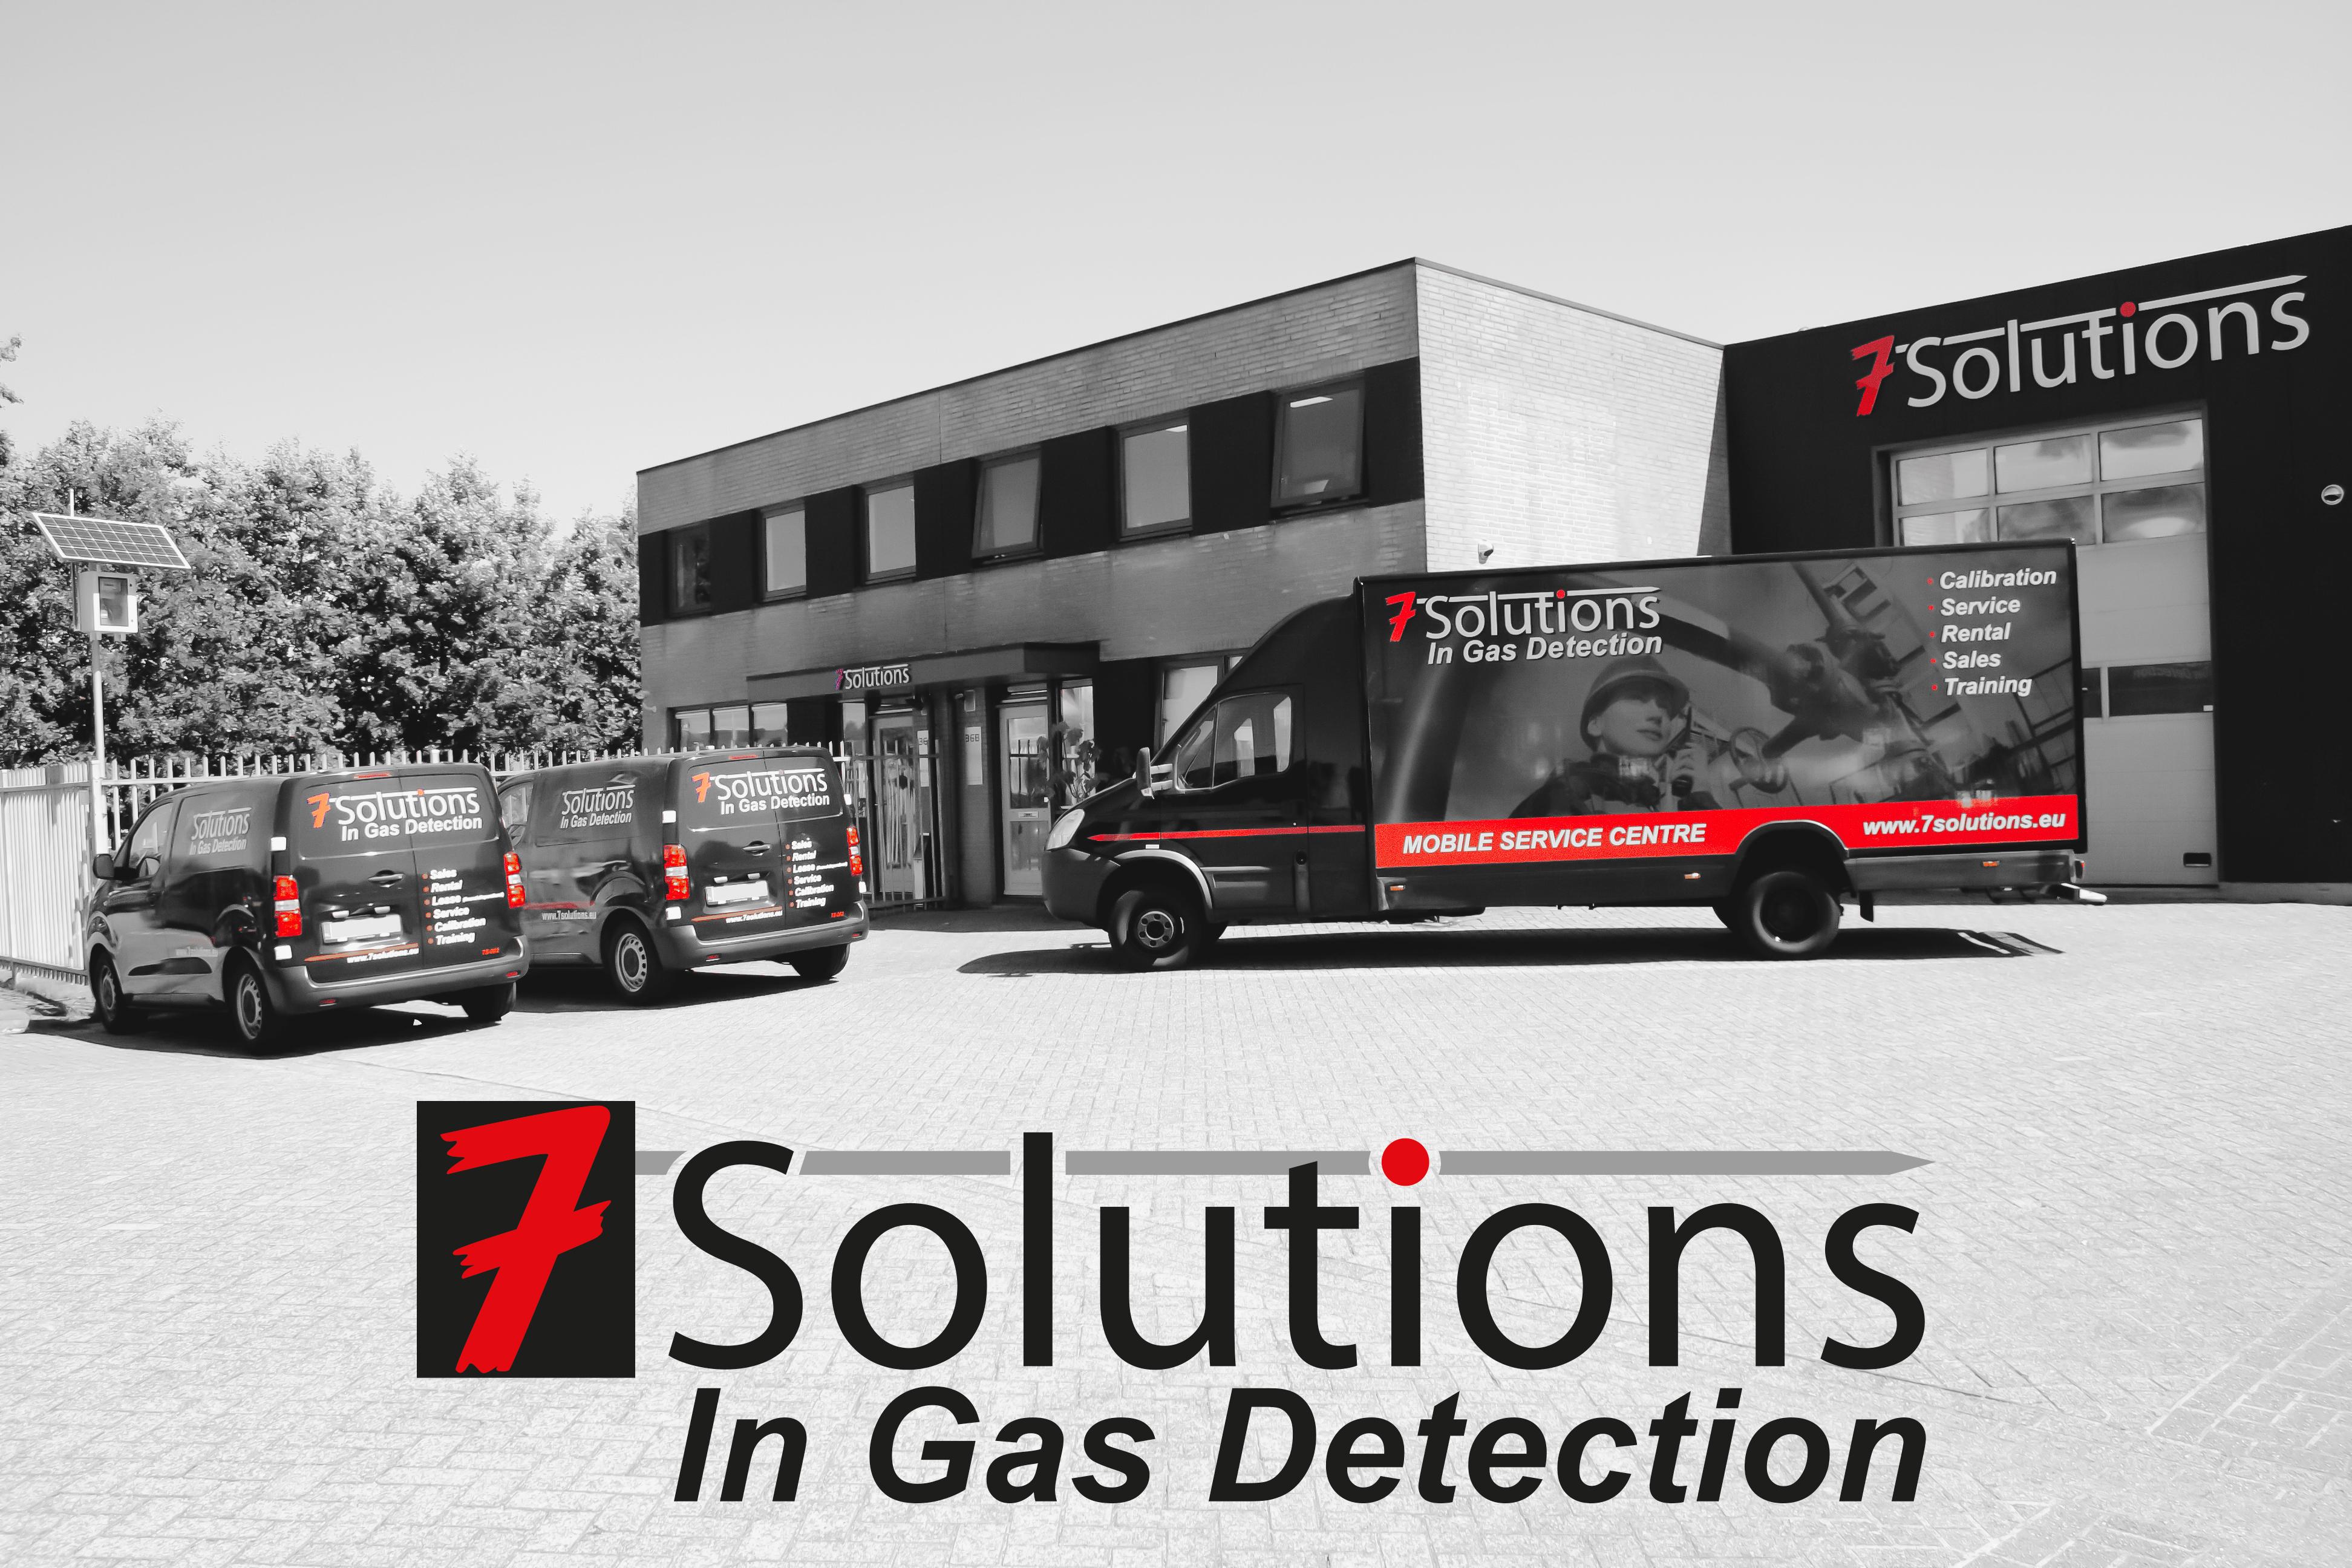 kwaliteit in gasdetectie